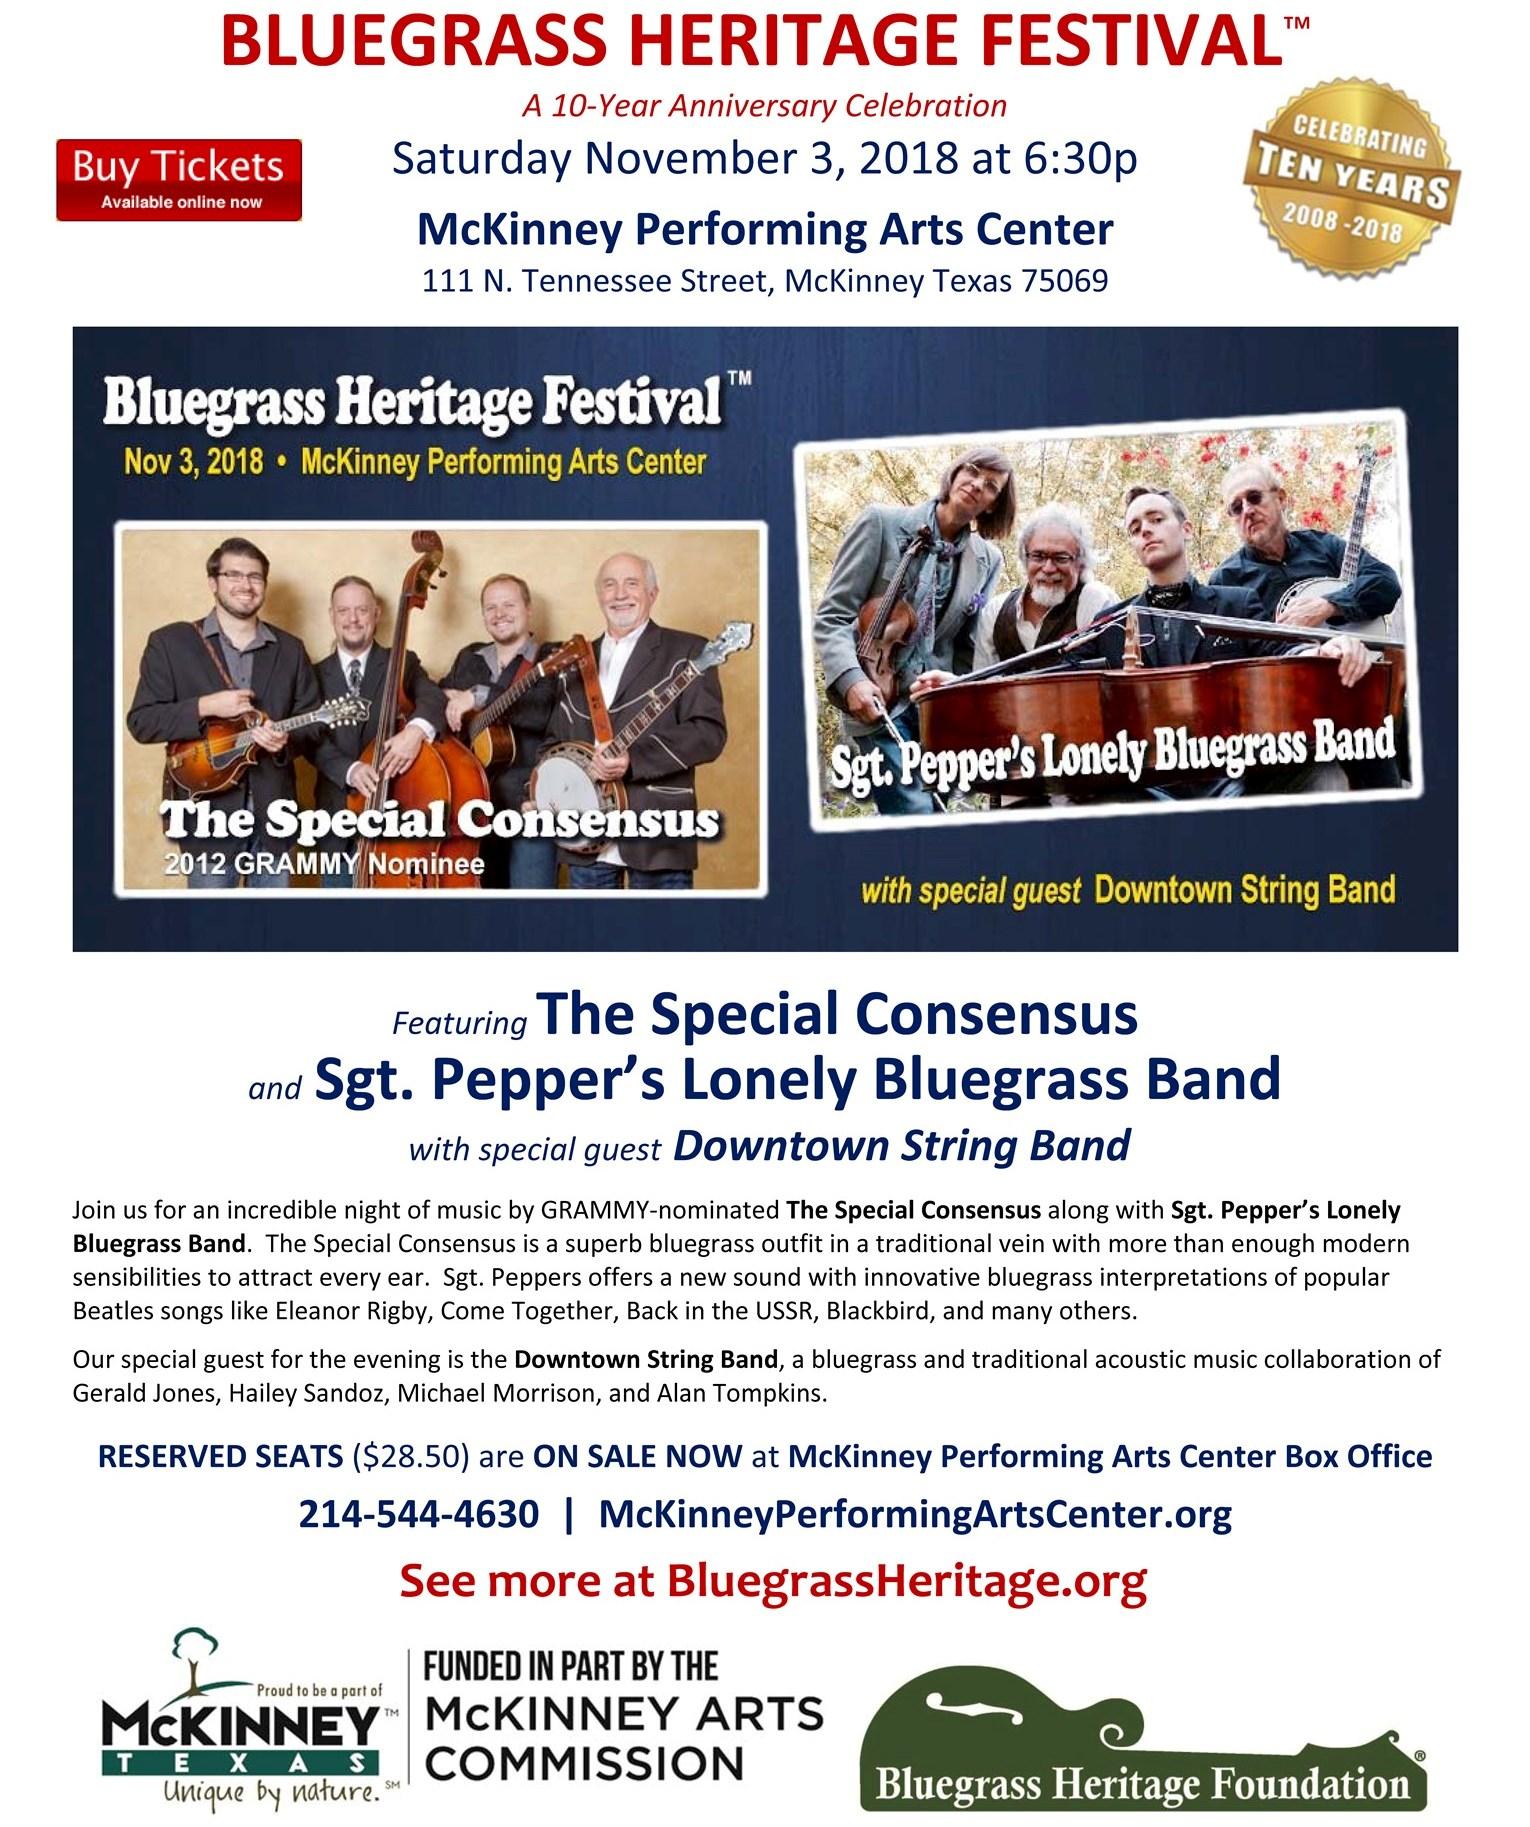 Bluegrass Heritage Festival 2018 Flyer